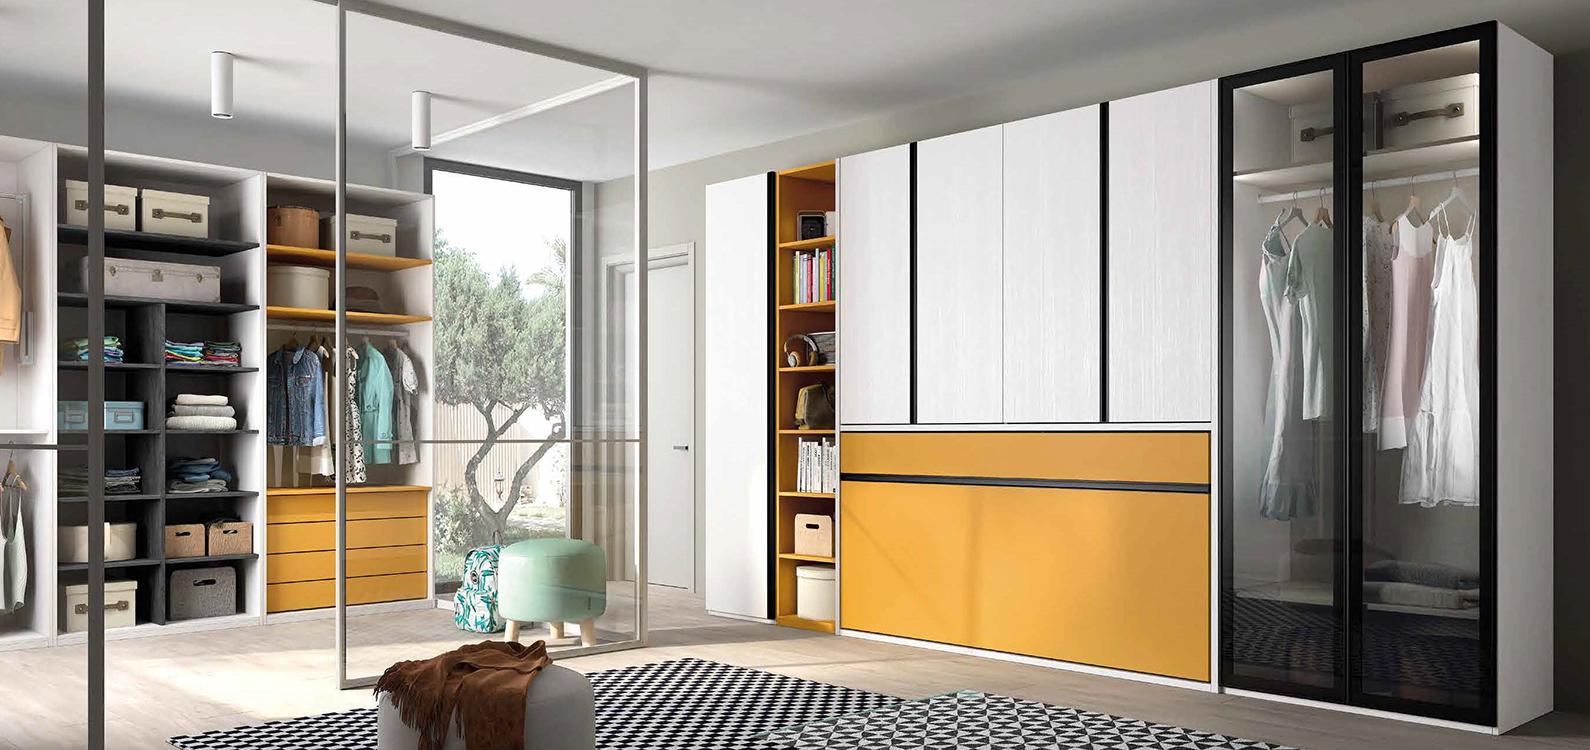 http://www.munozmuebles.net/nueva/catalogo/juveniles-modulares.html - Estilos de  muebles del hogar